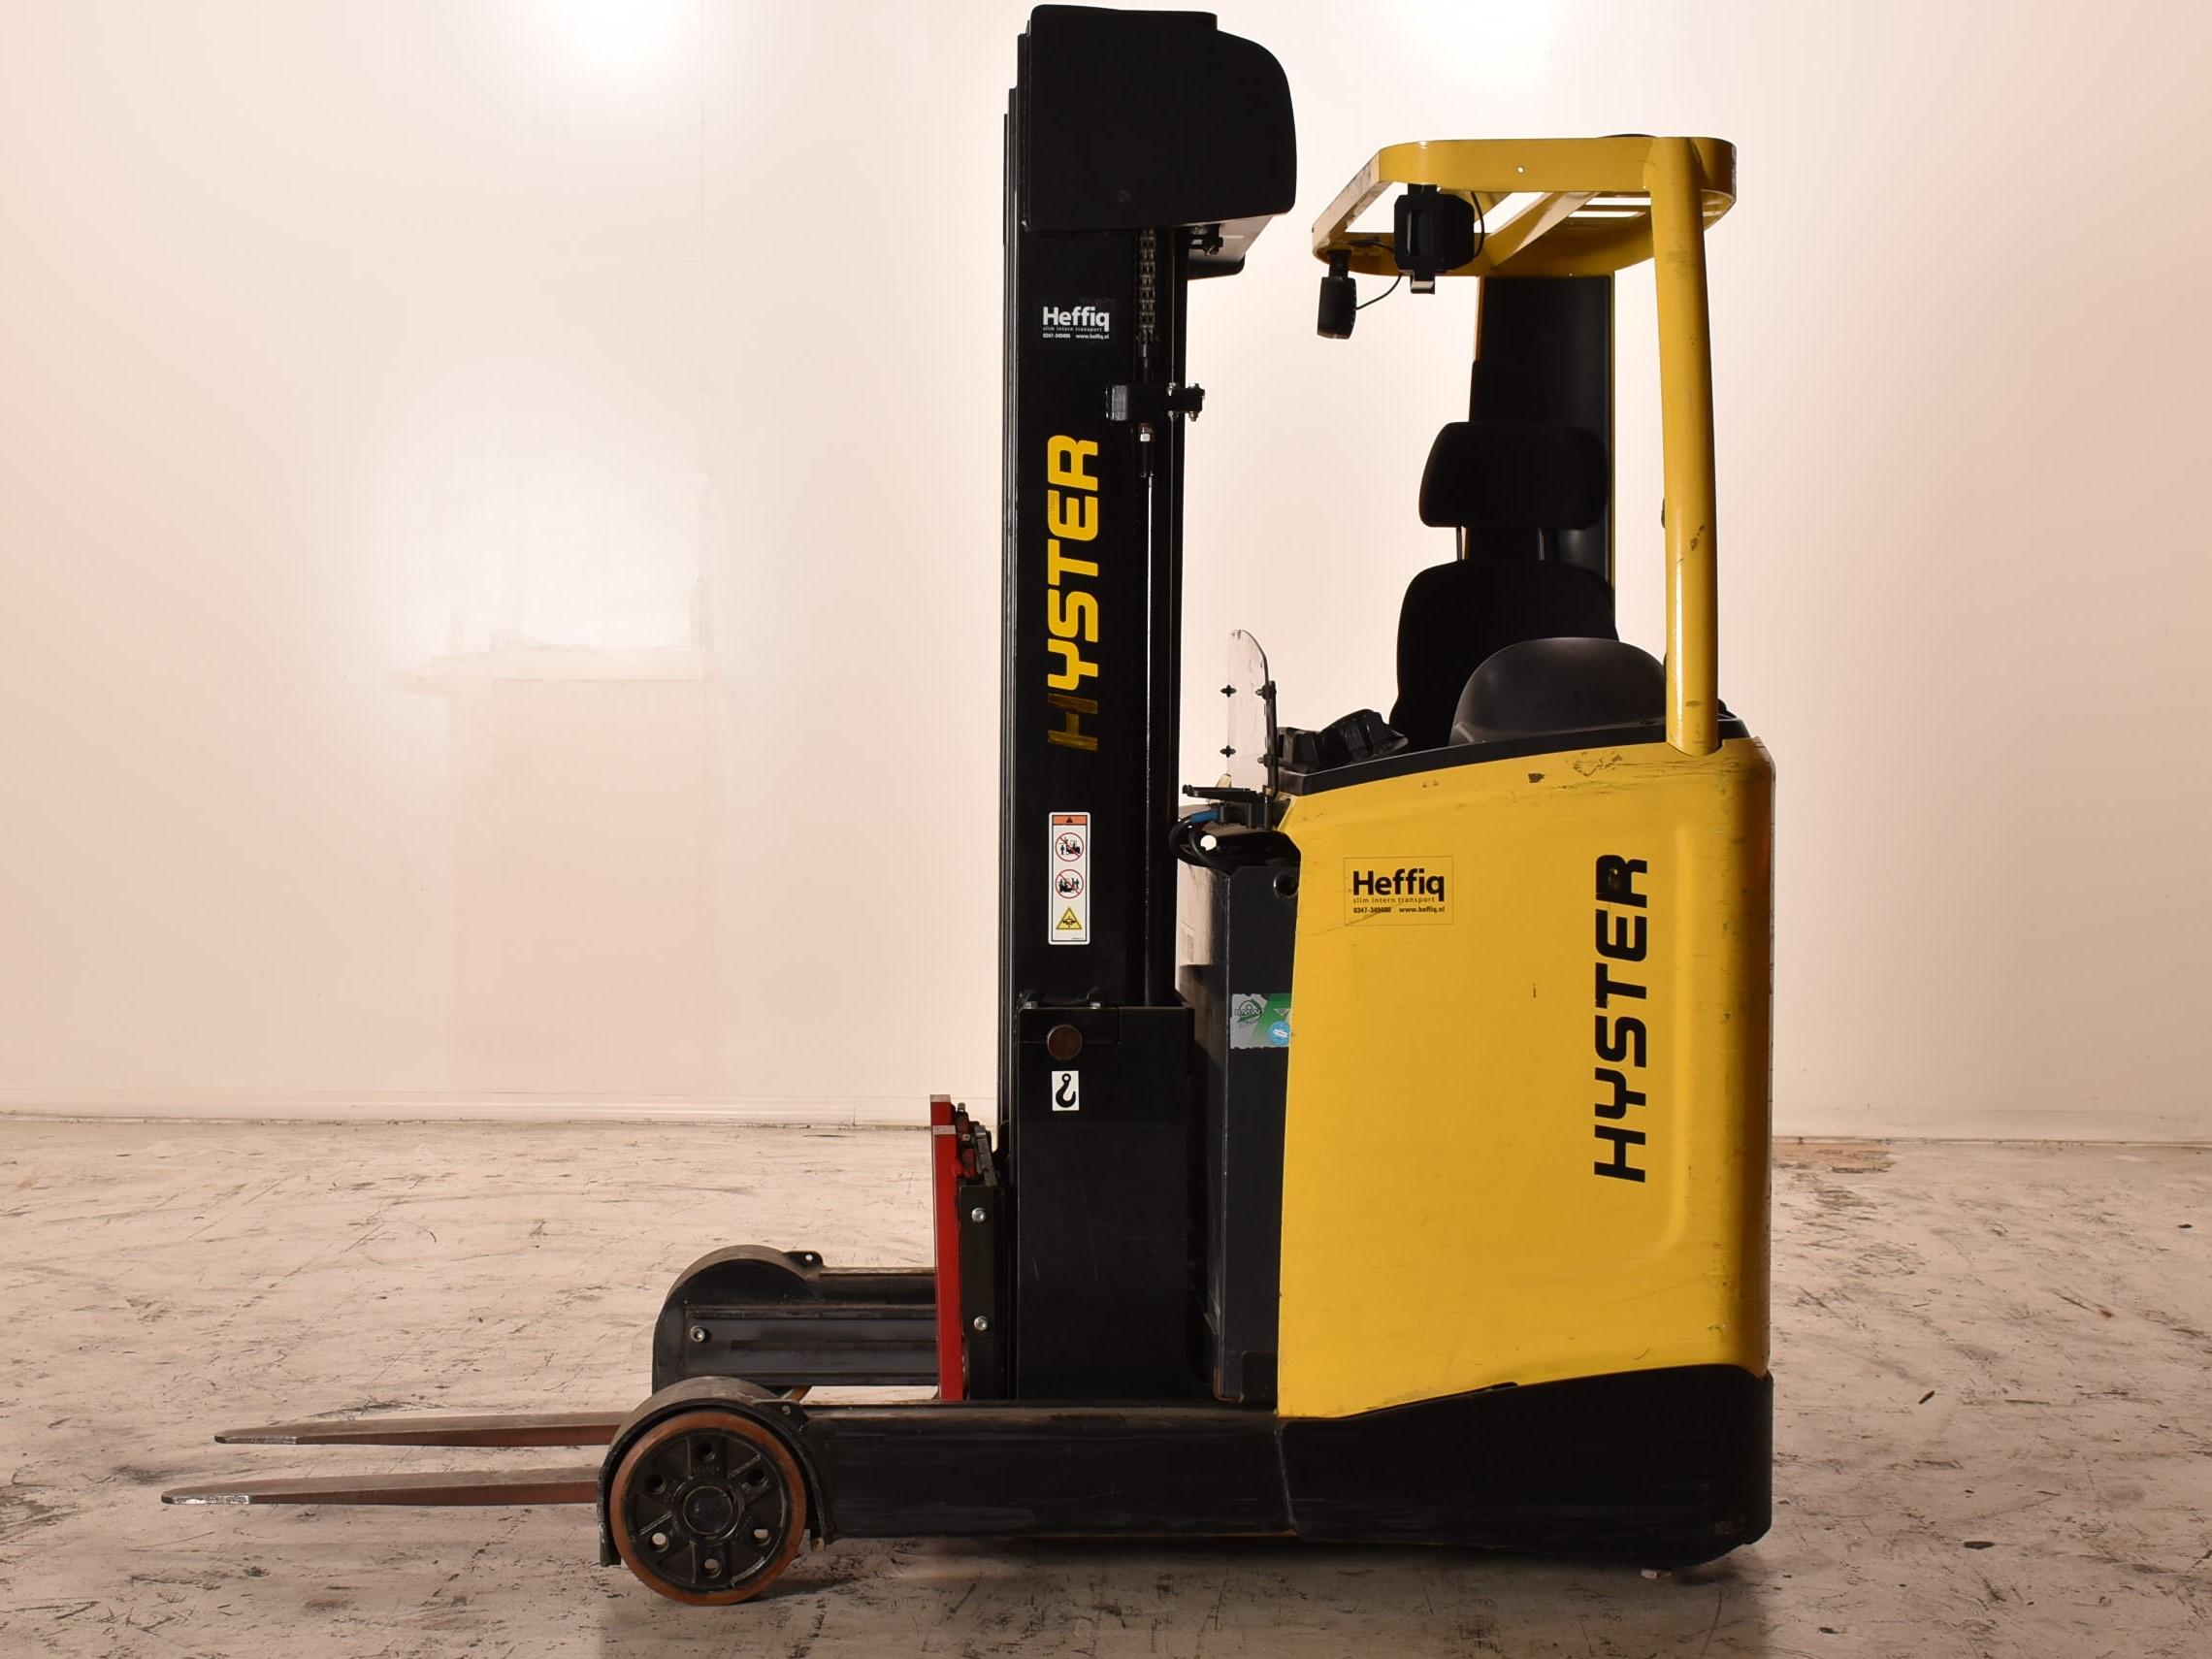 Hyster R1.4-48, Reach Trucks, Material Handling